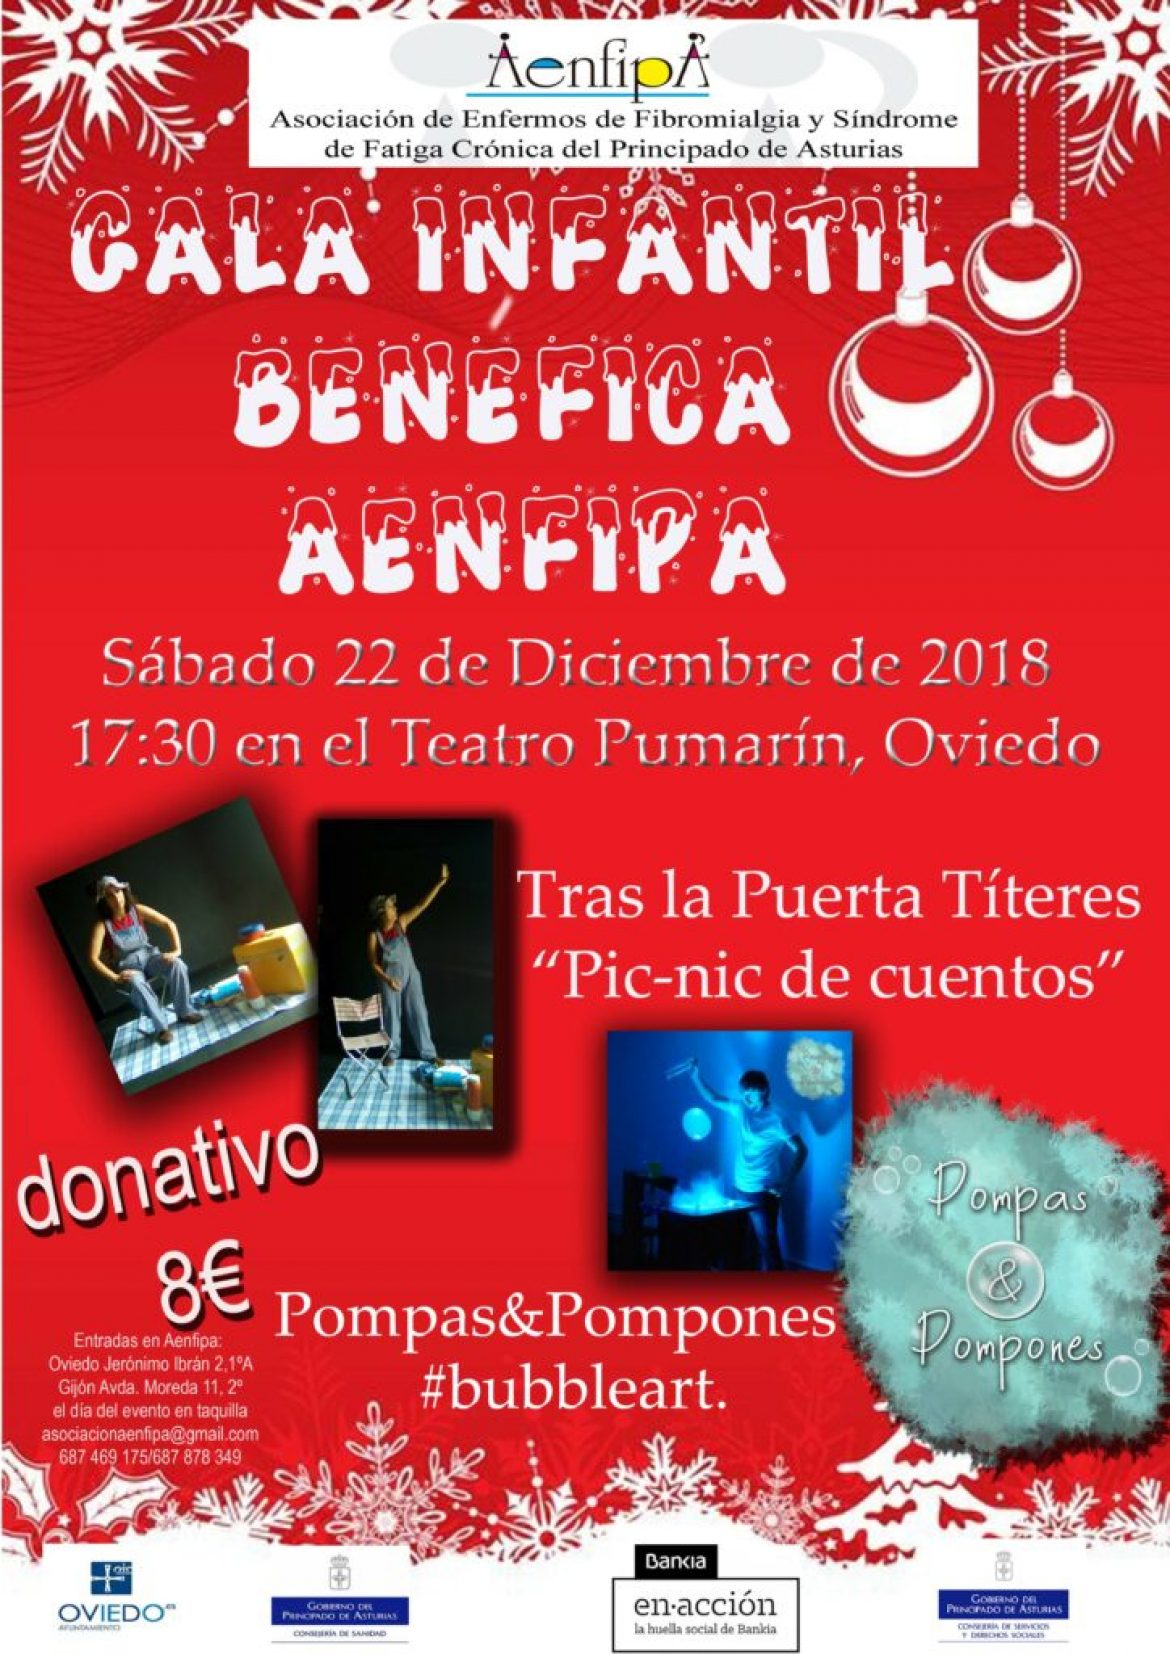 Sábado 22 de Diciembre Gala Infantil